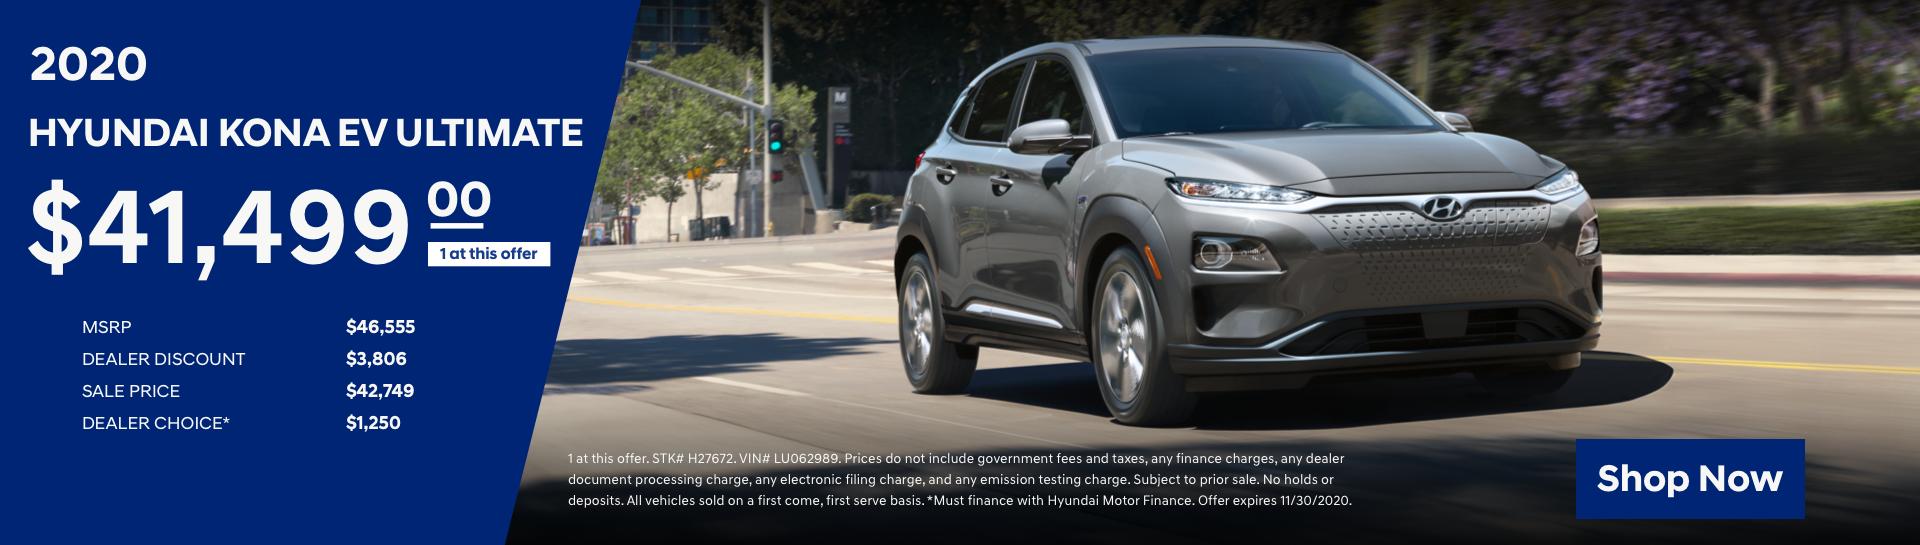 2020 Hyundai Kona EV Purchase